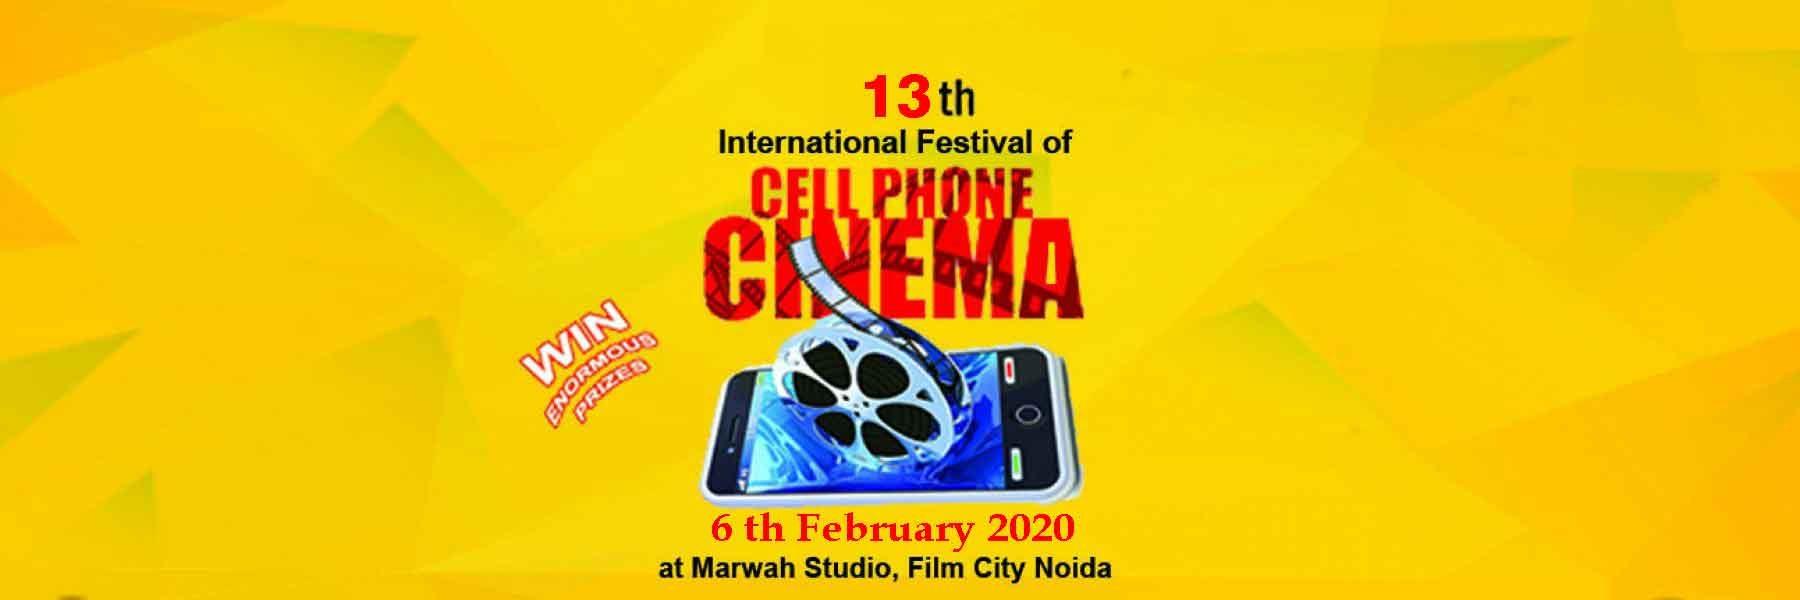 CellPhone Cinema 2020